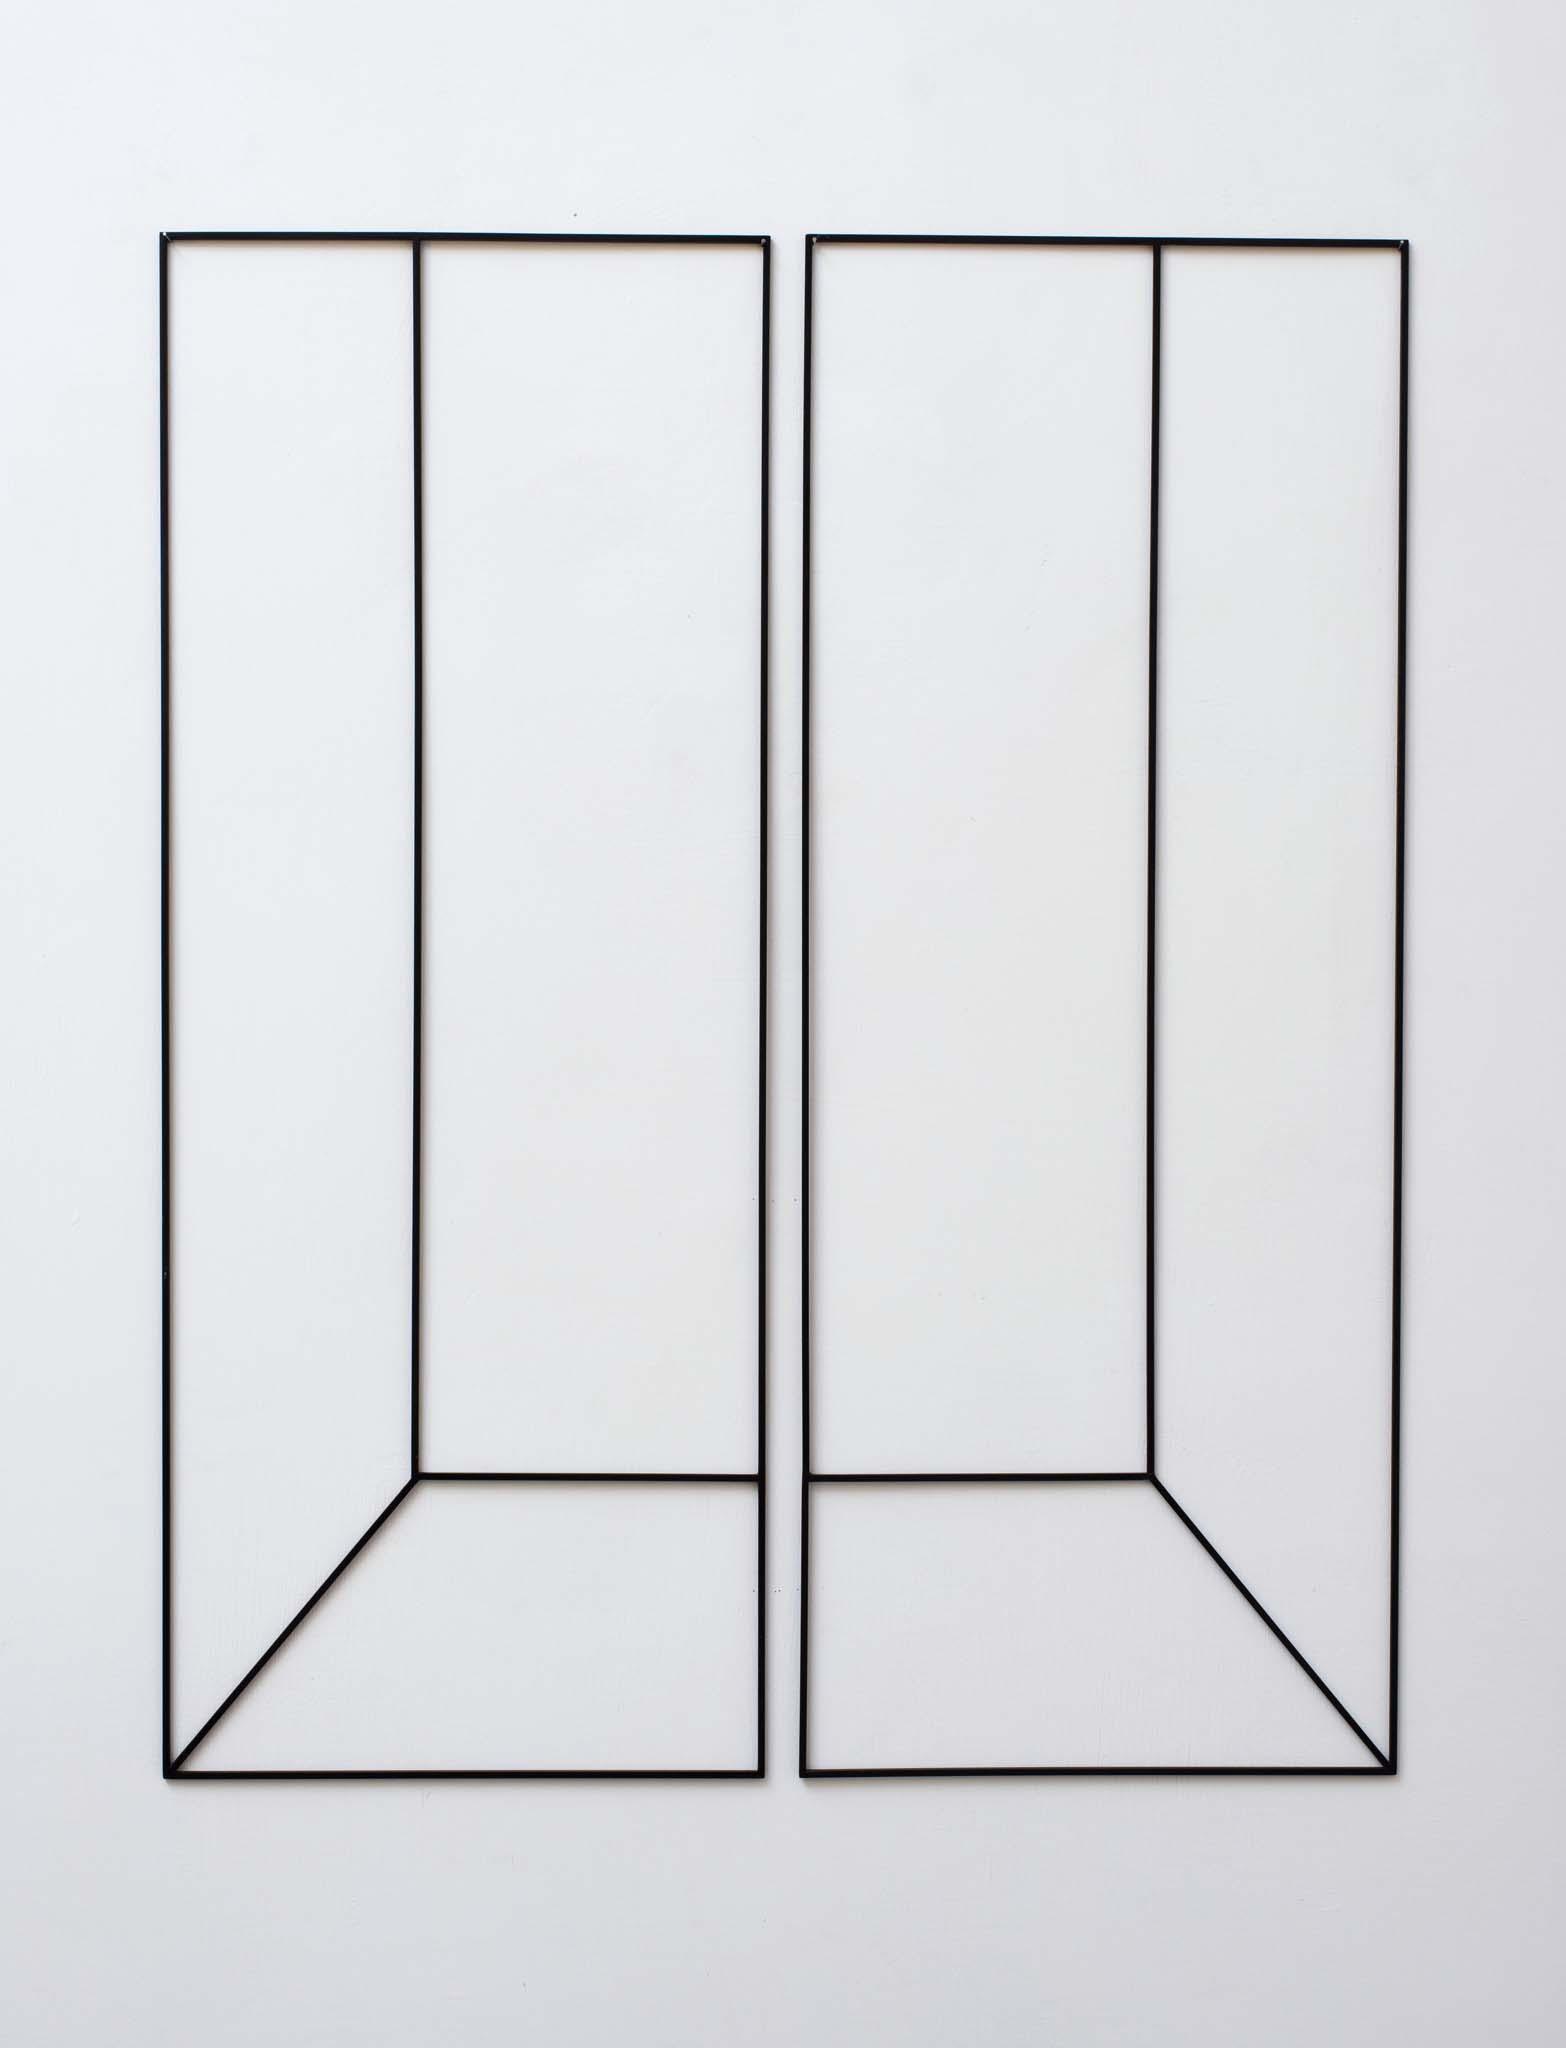 Haris Epaminonda  Untitled, 2014  Courtesy Galleria Massimo Minini and the artist